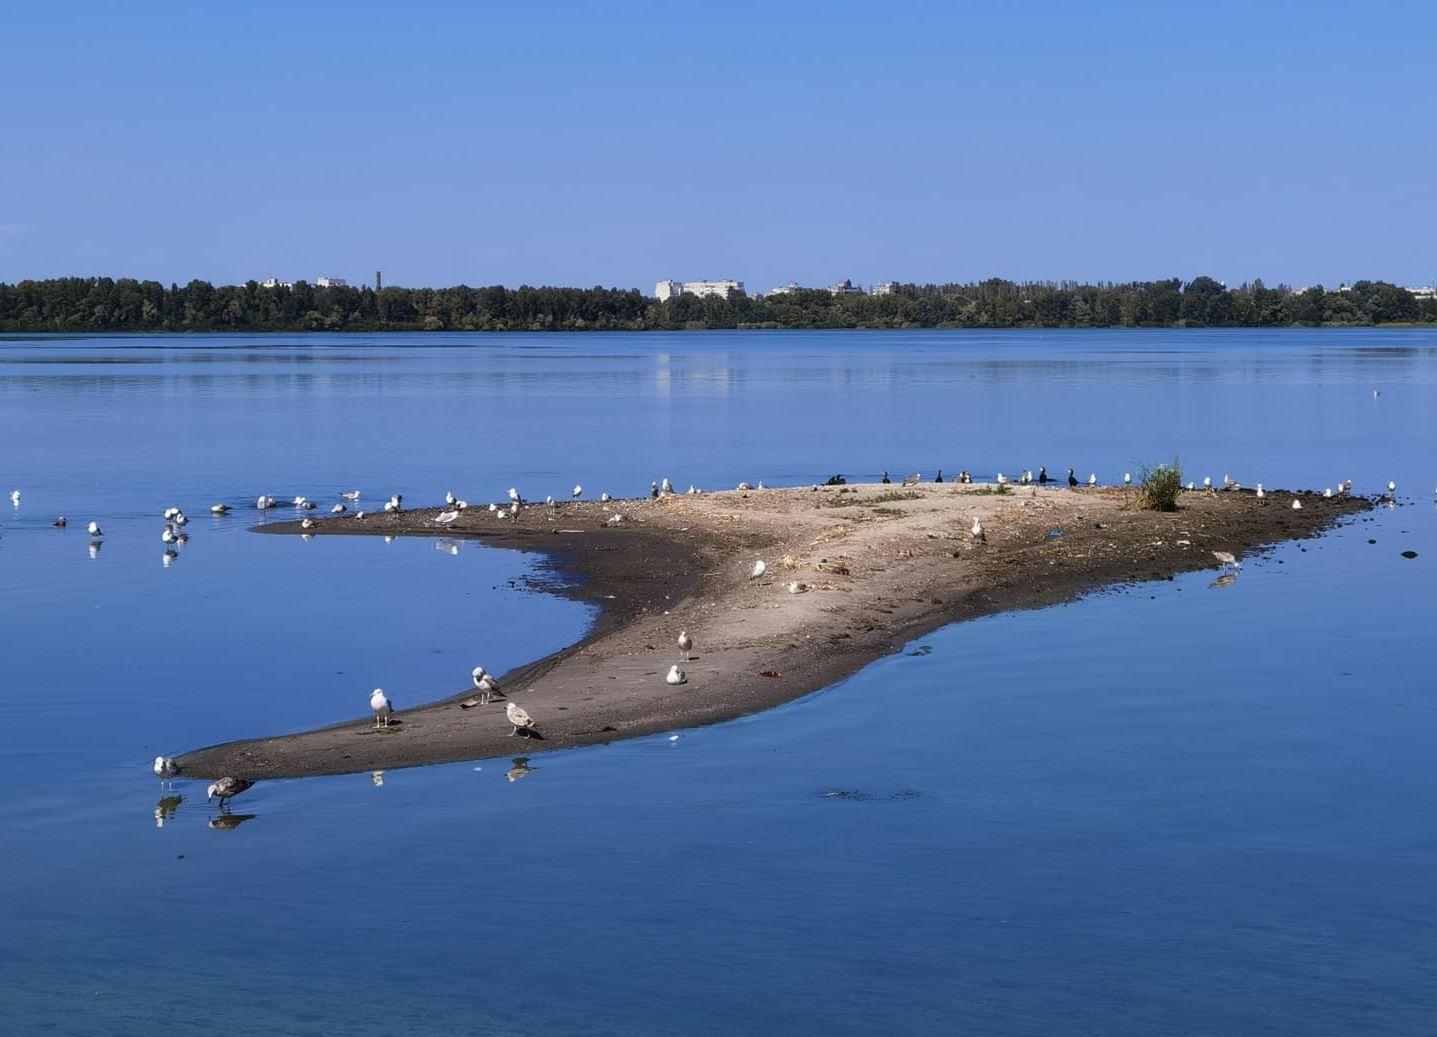 В Днепре посреди реки неожиданно вырос остров – фото